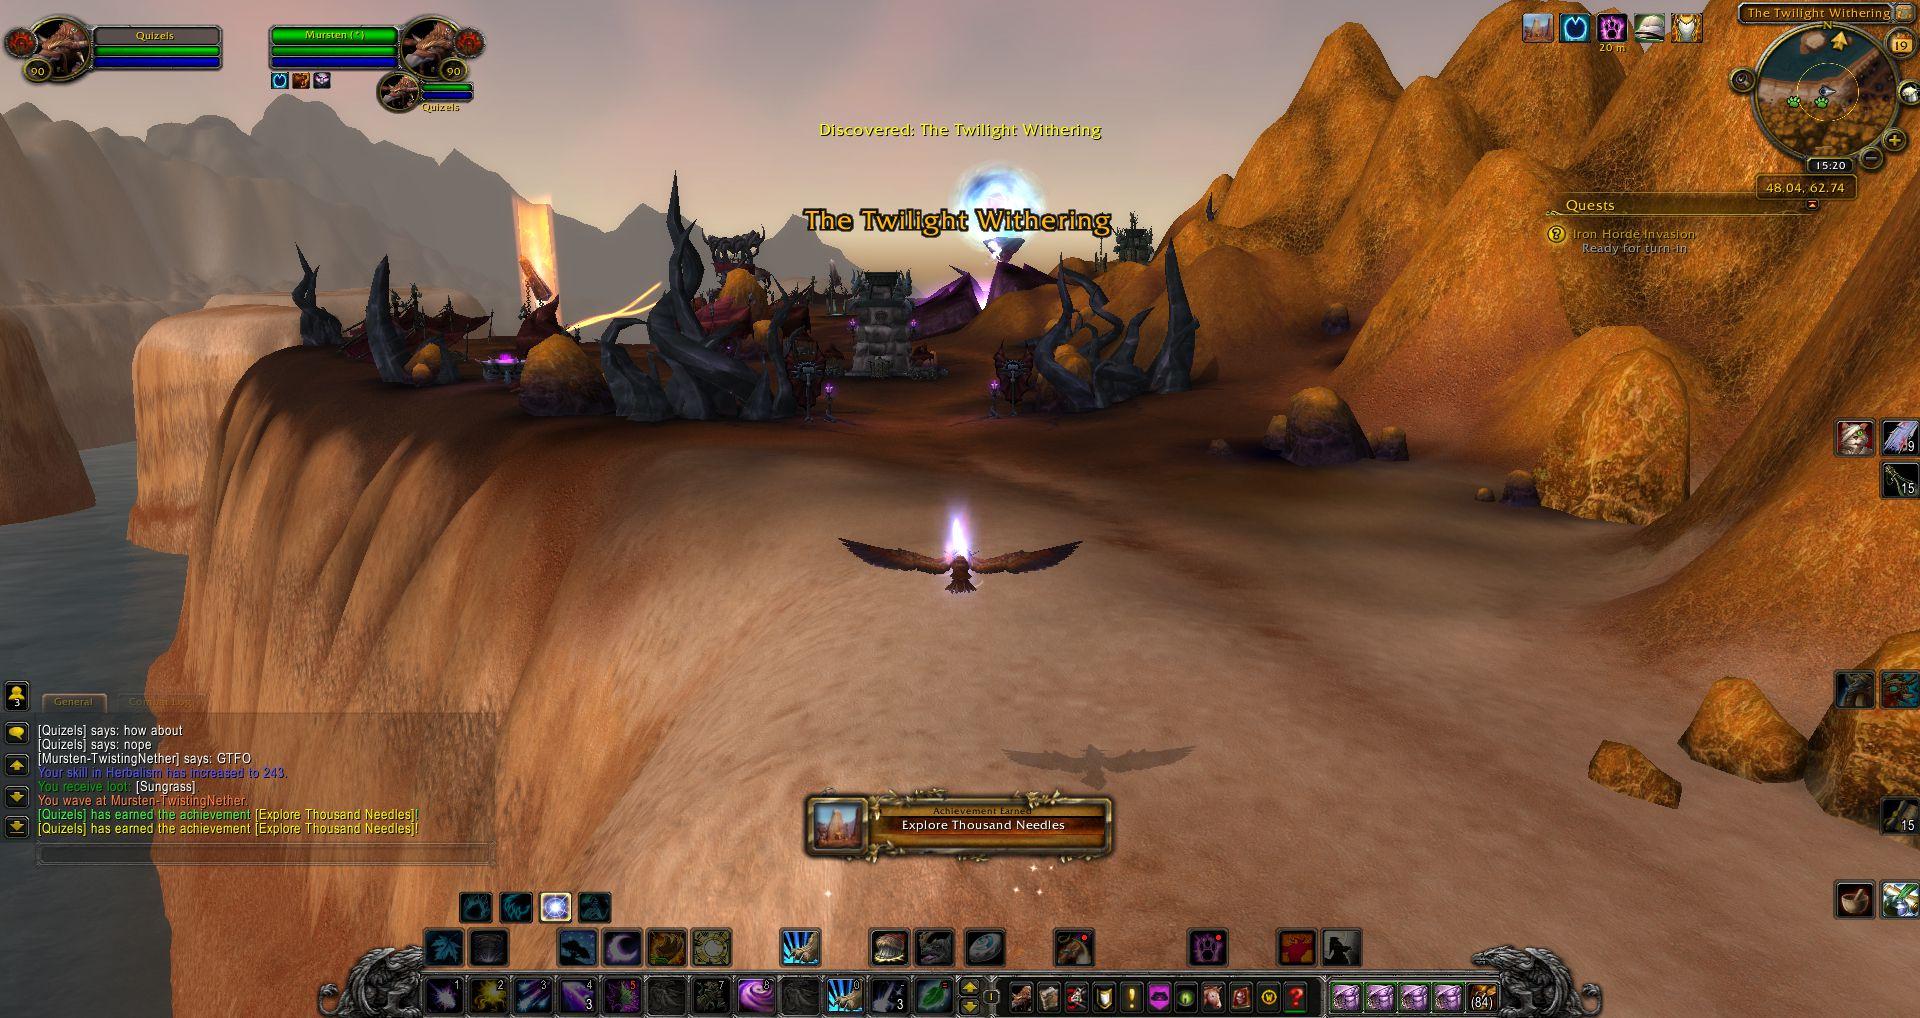 Explore Thousand Needles wow screenshot - Gamingcfg com